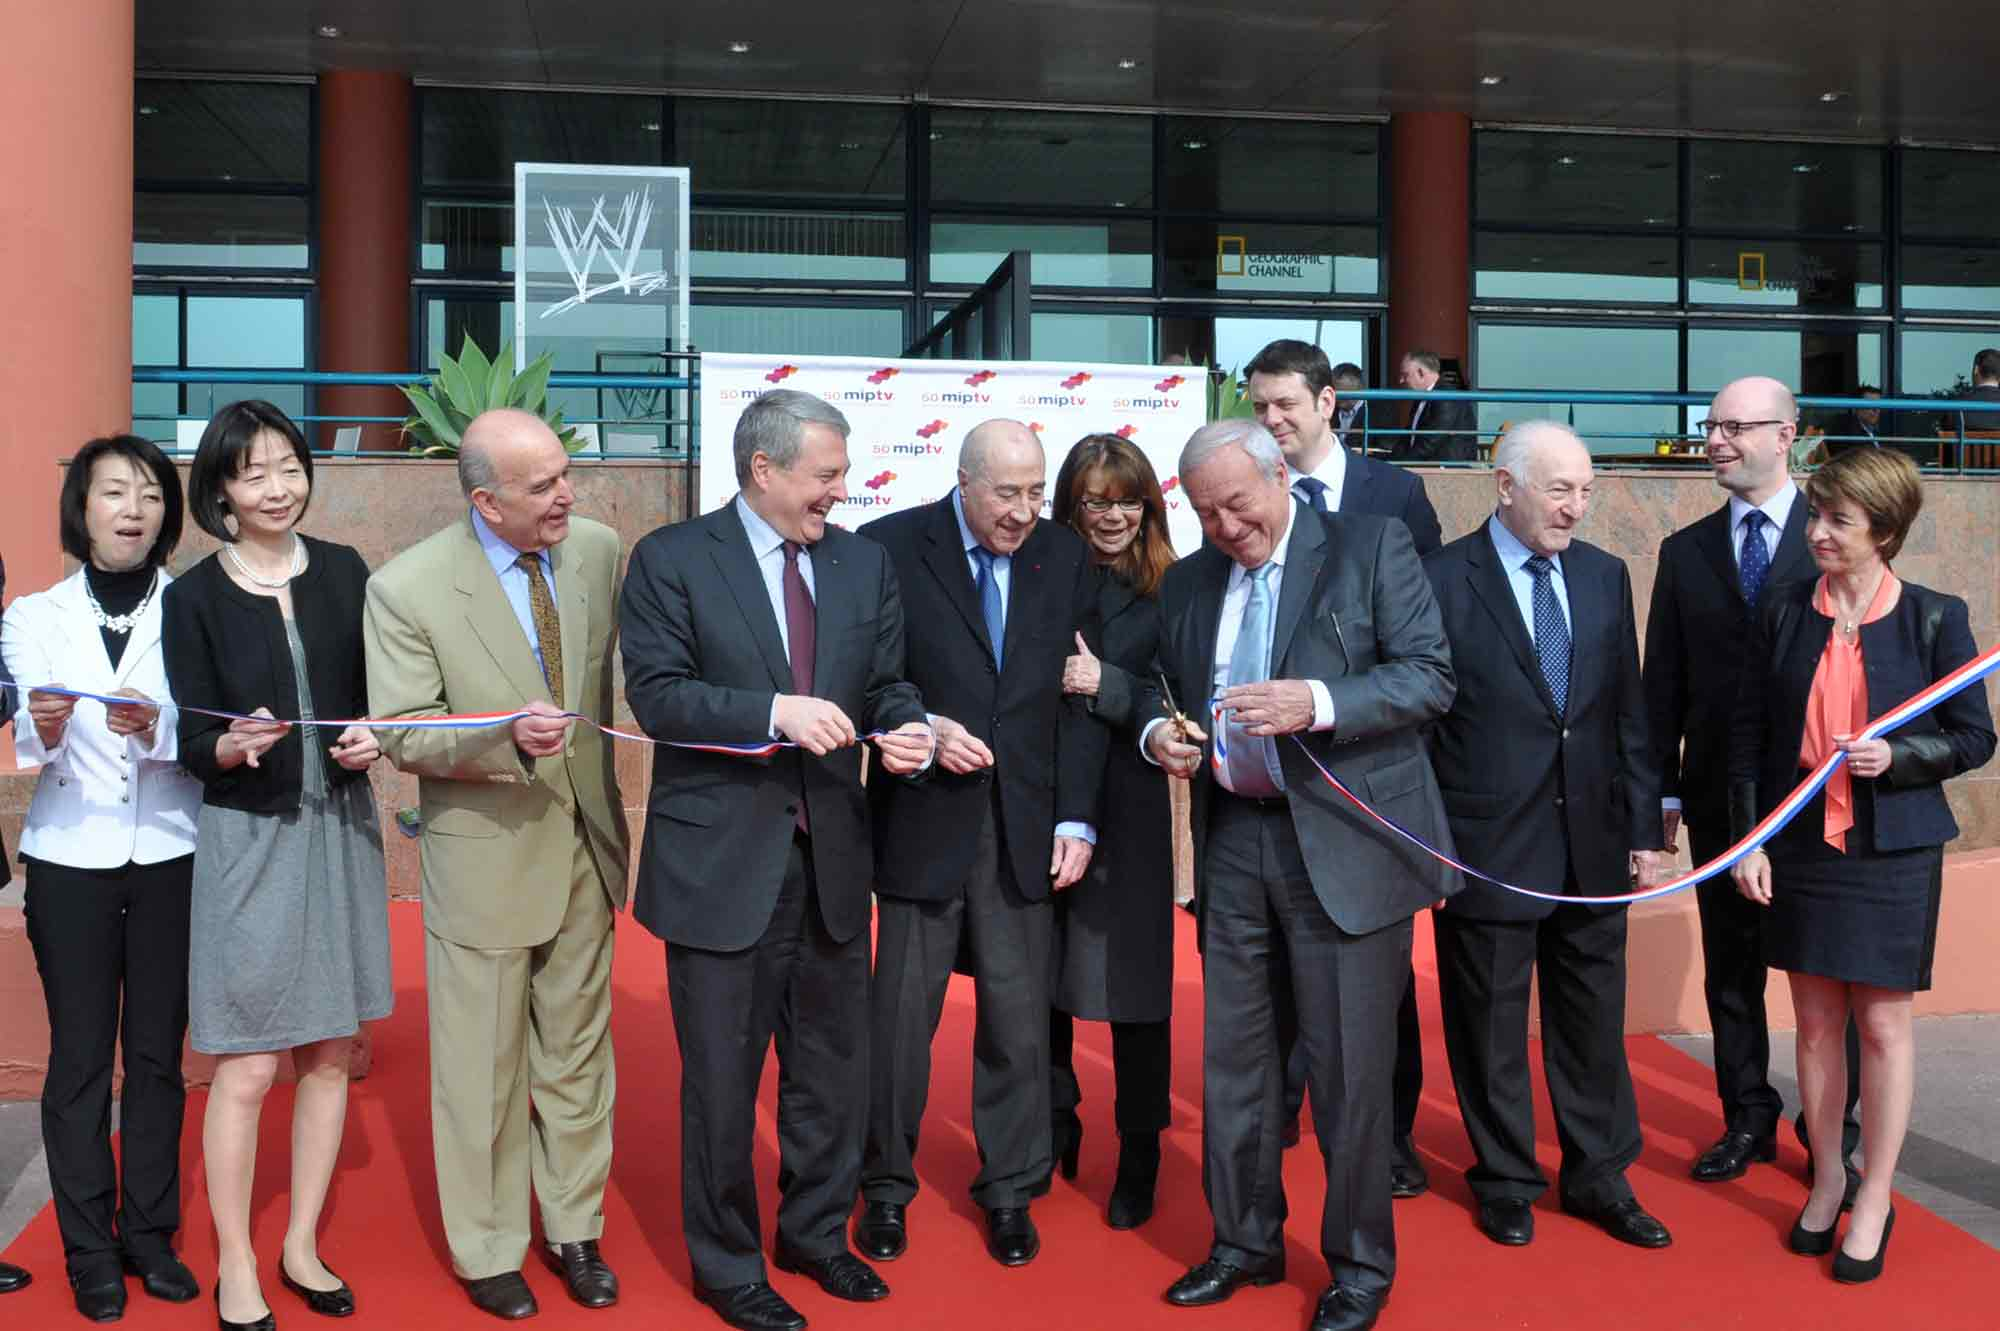 miptv 2013 inauguration